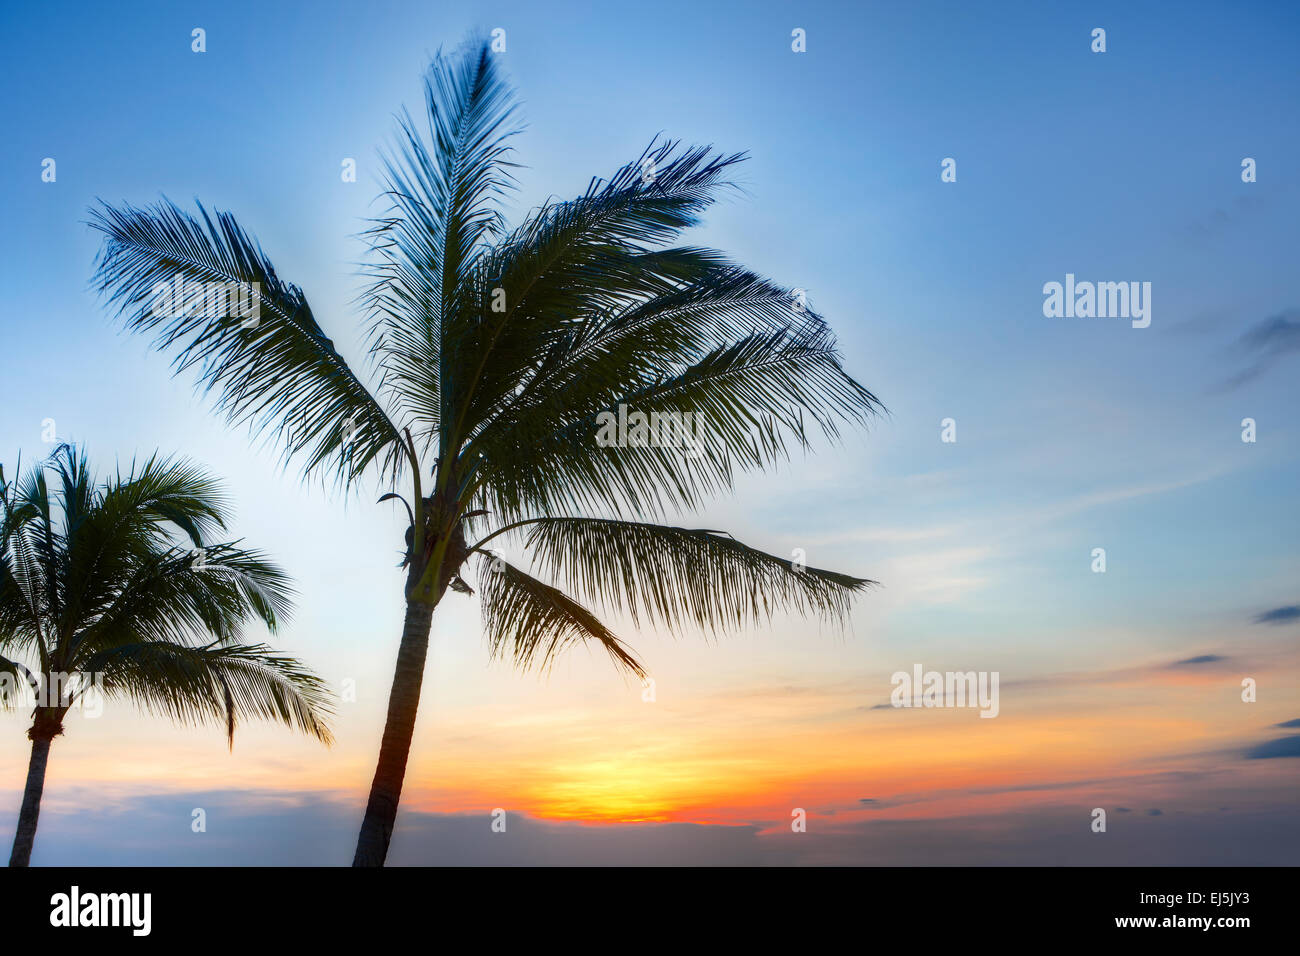 Sunset on Phu Quoc island, Vietnam. - Stock Image